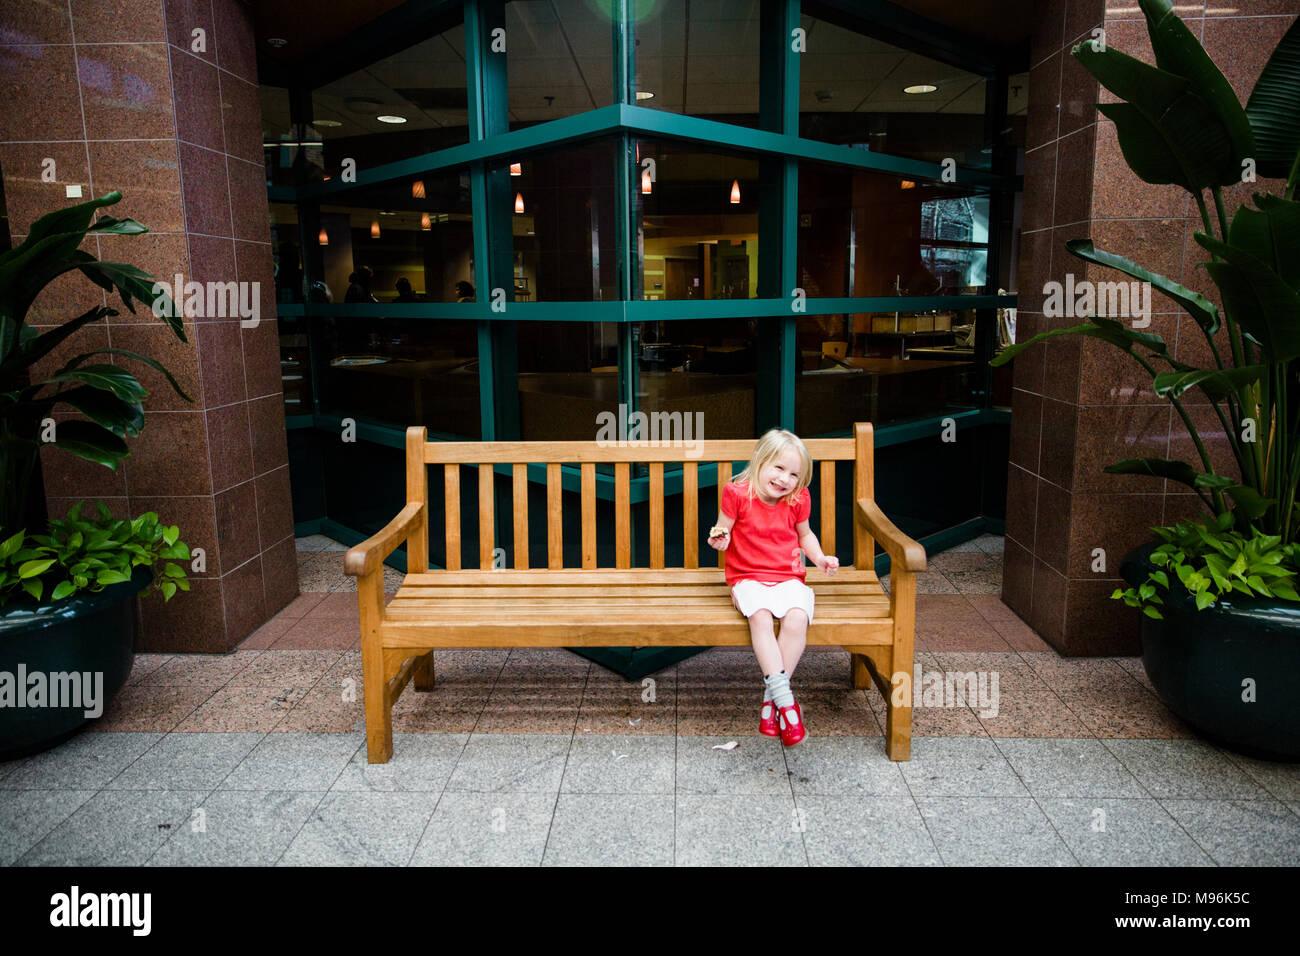 Chica con camiseta roja sentados en banco de madera Imagen De Stock